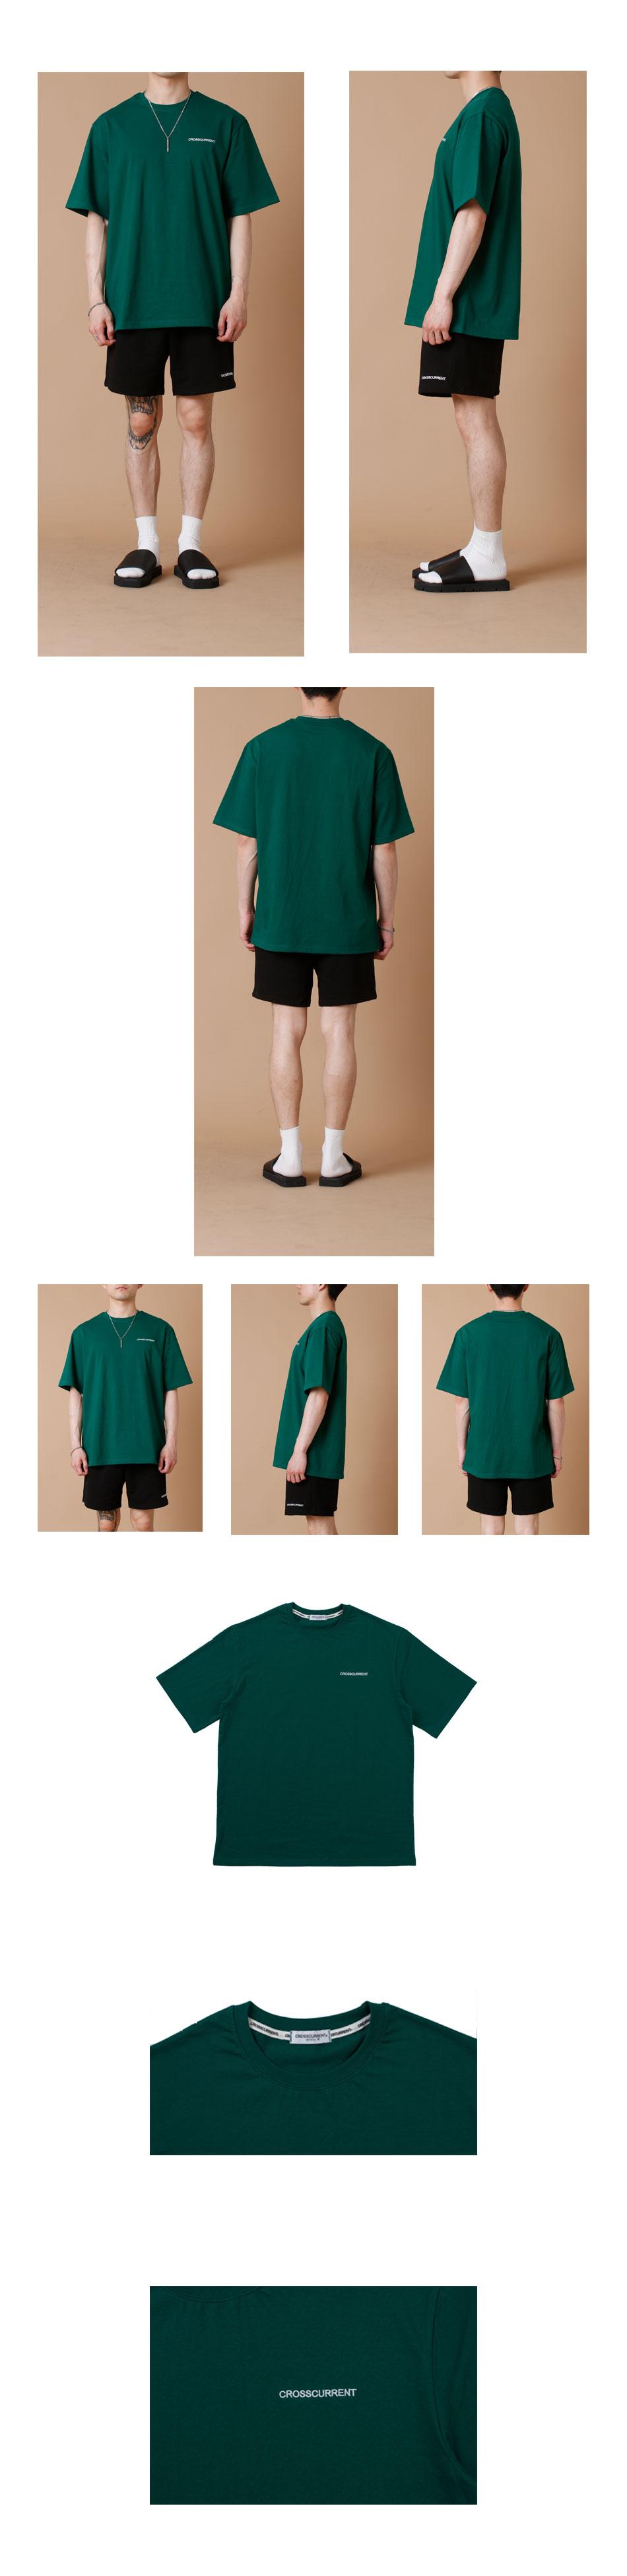 #crct00002-CCT-Small-Logo-Short-Sleeve-그린950.jpg